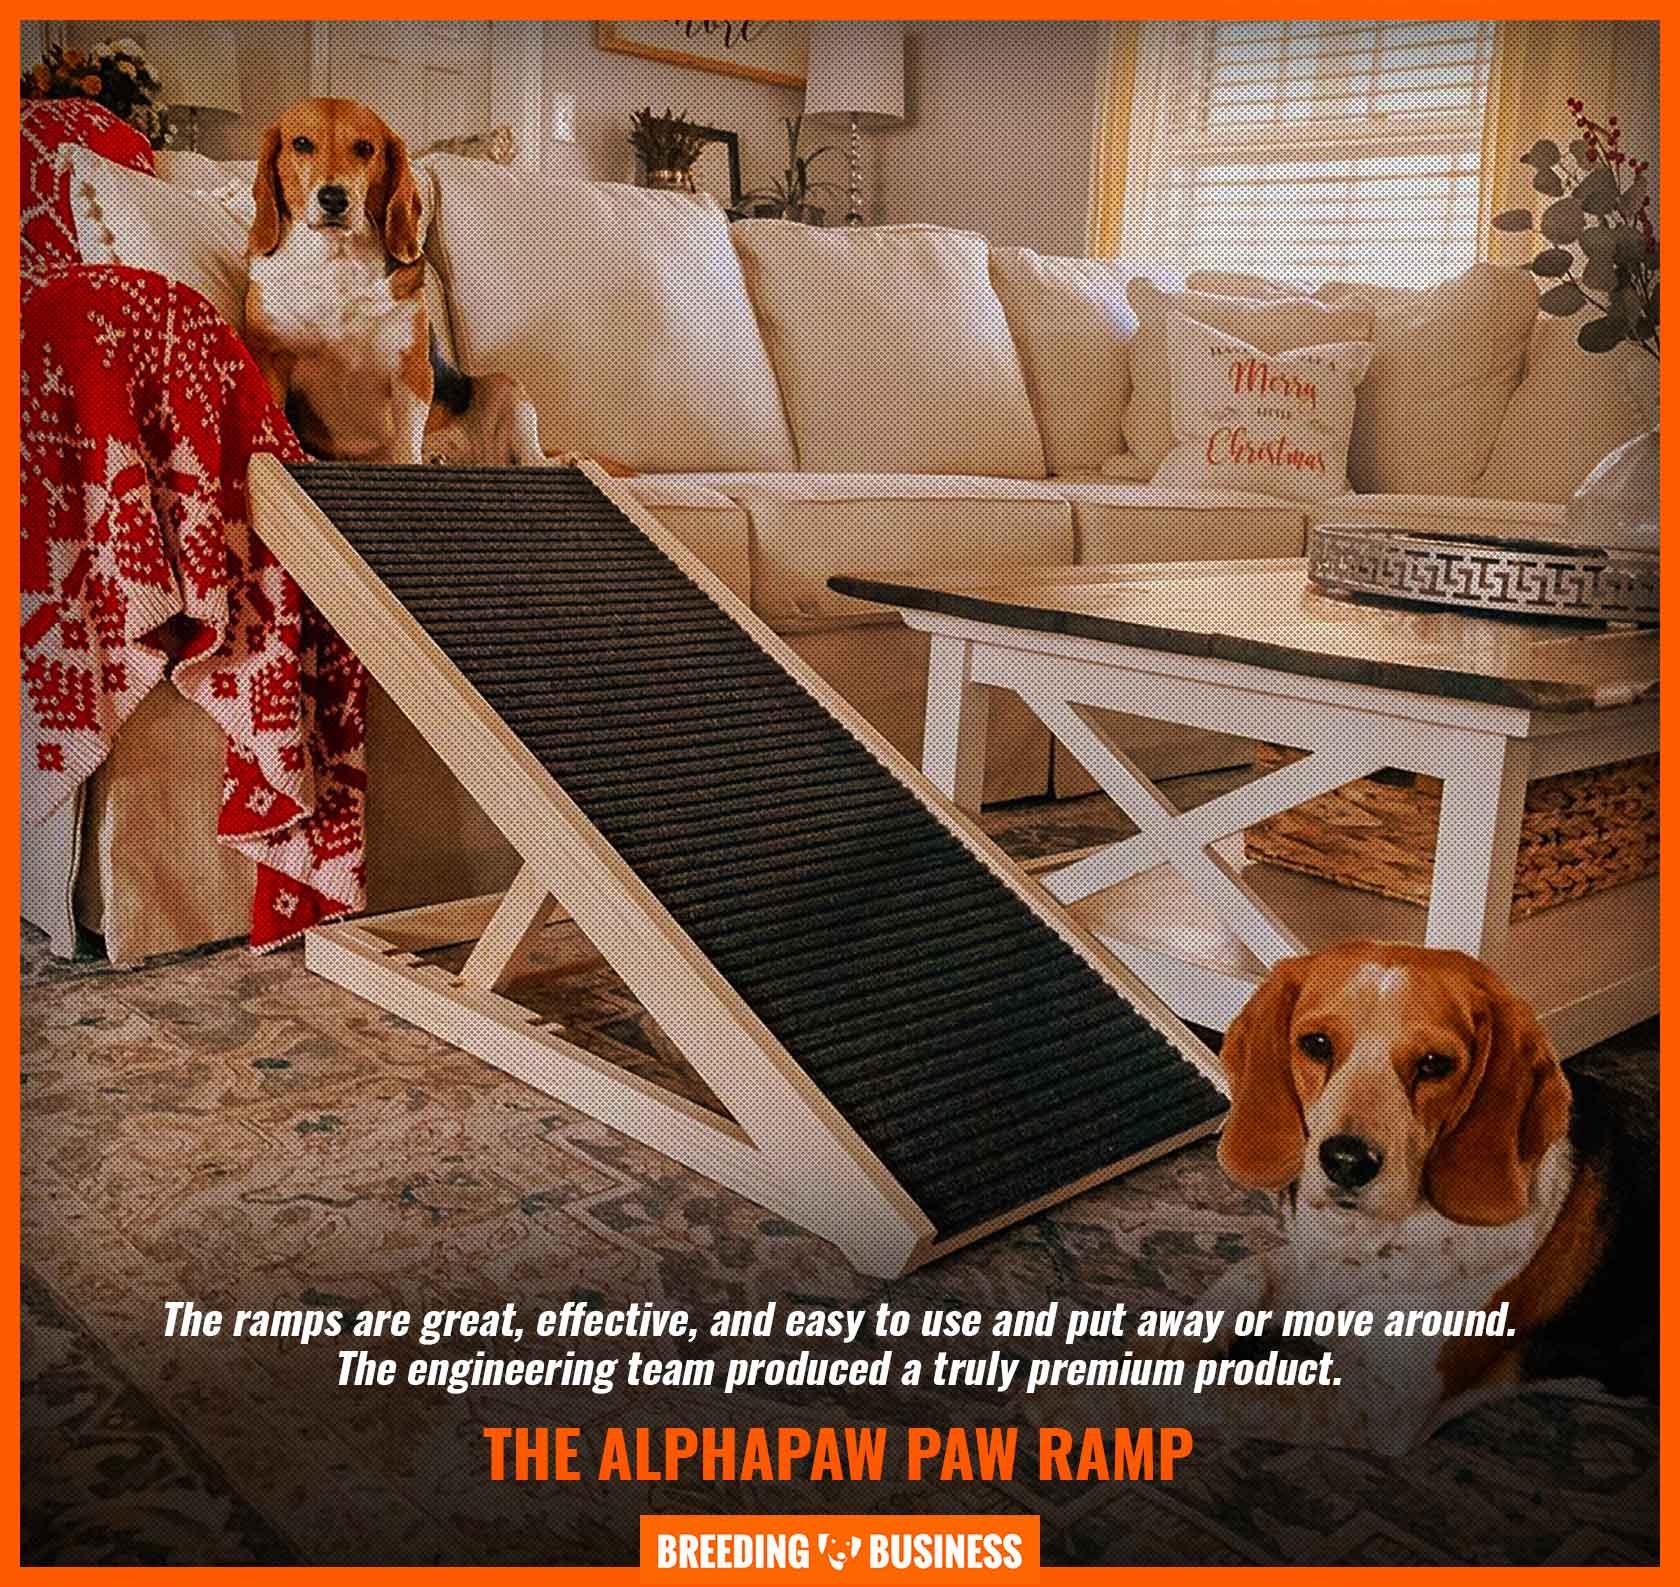 AlphaPaw PawRamp Review